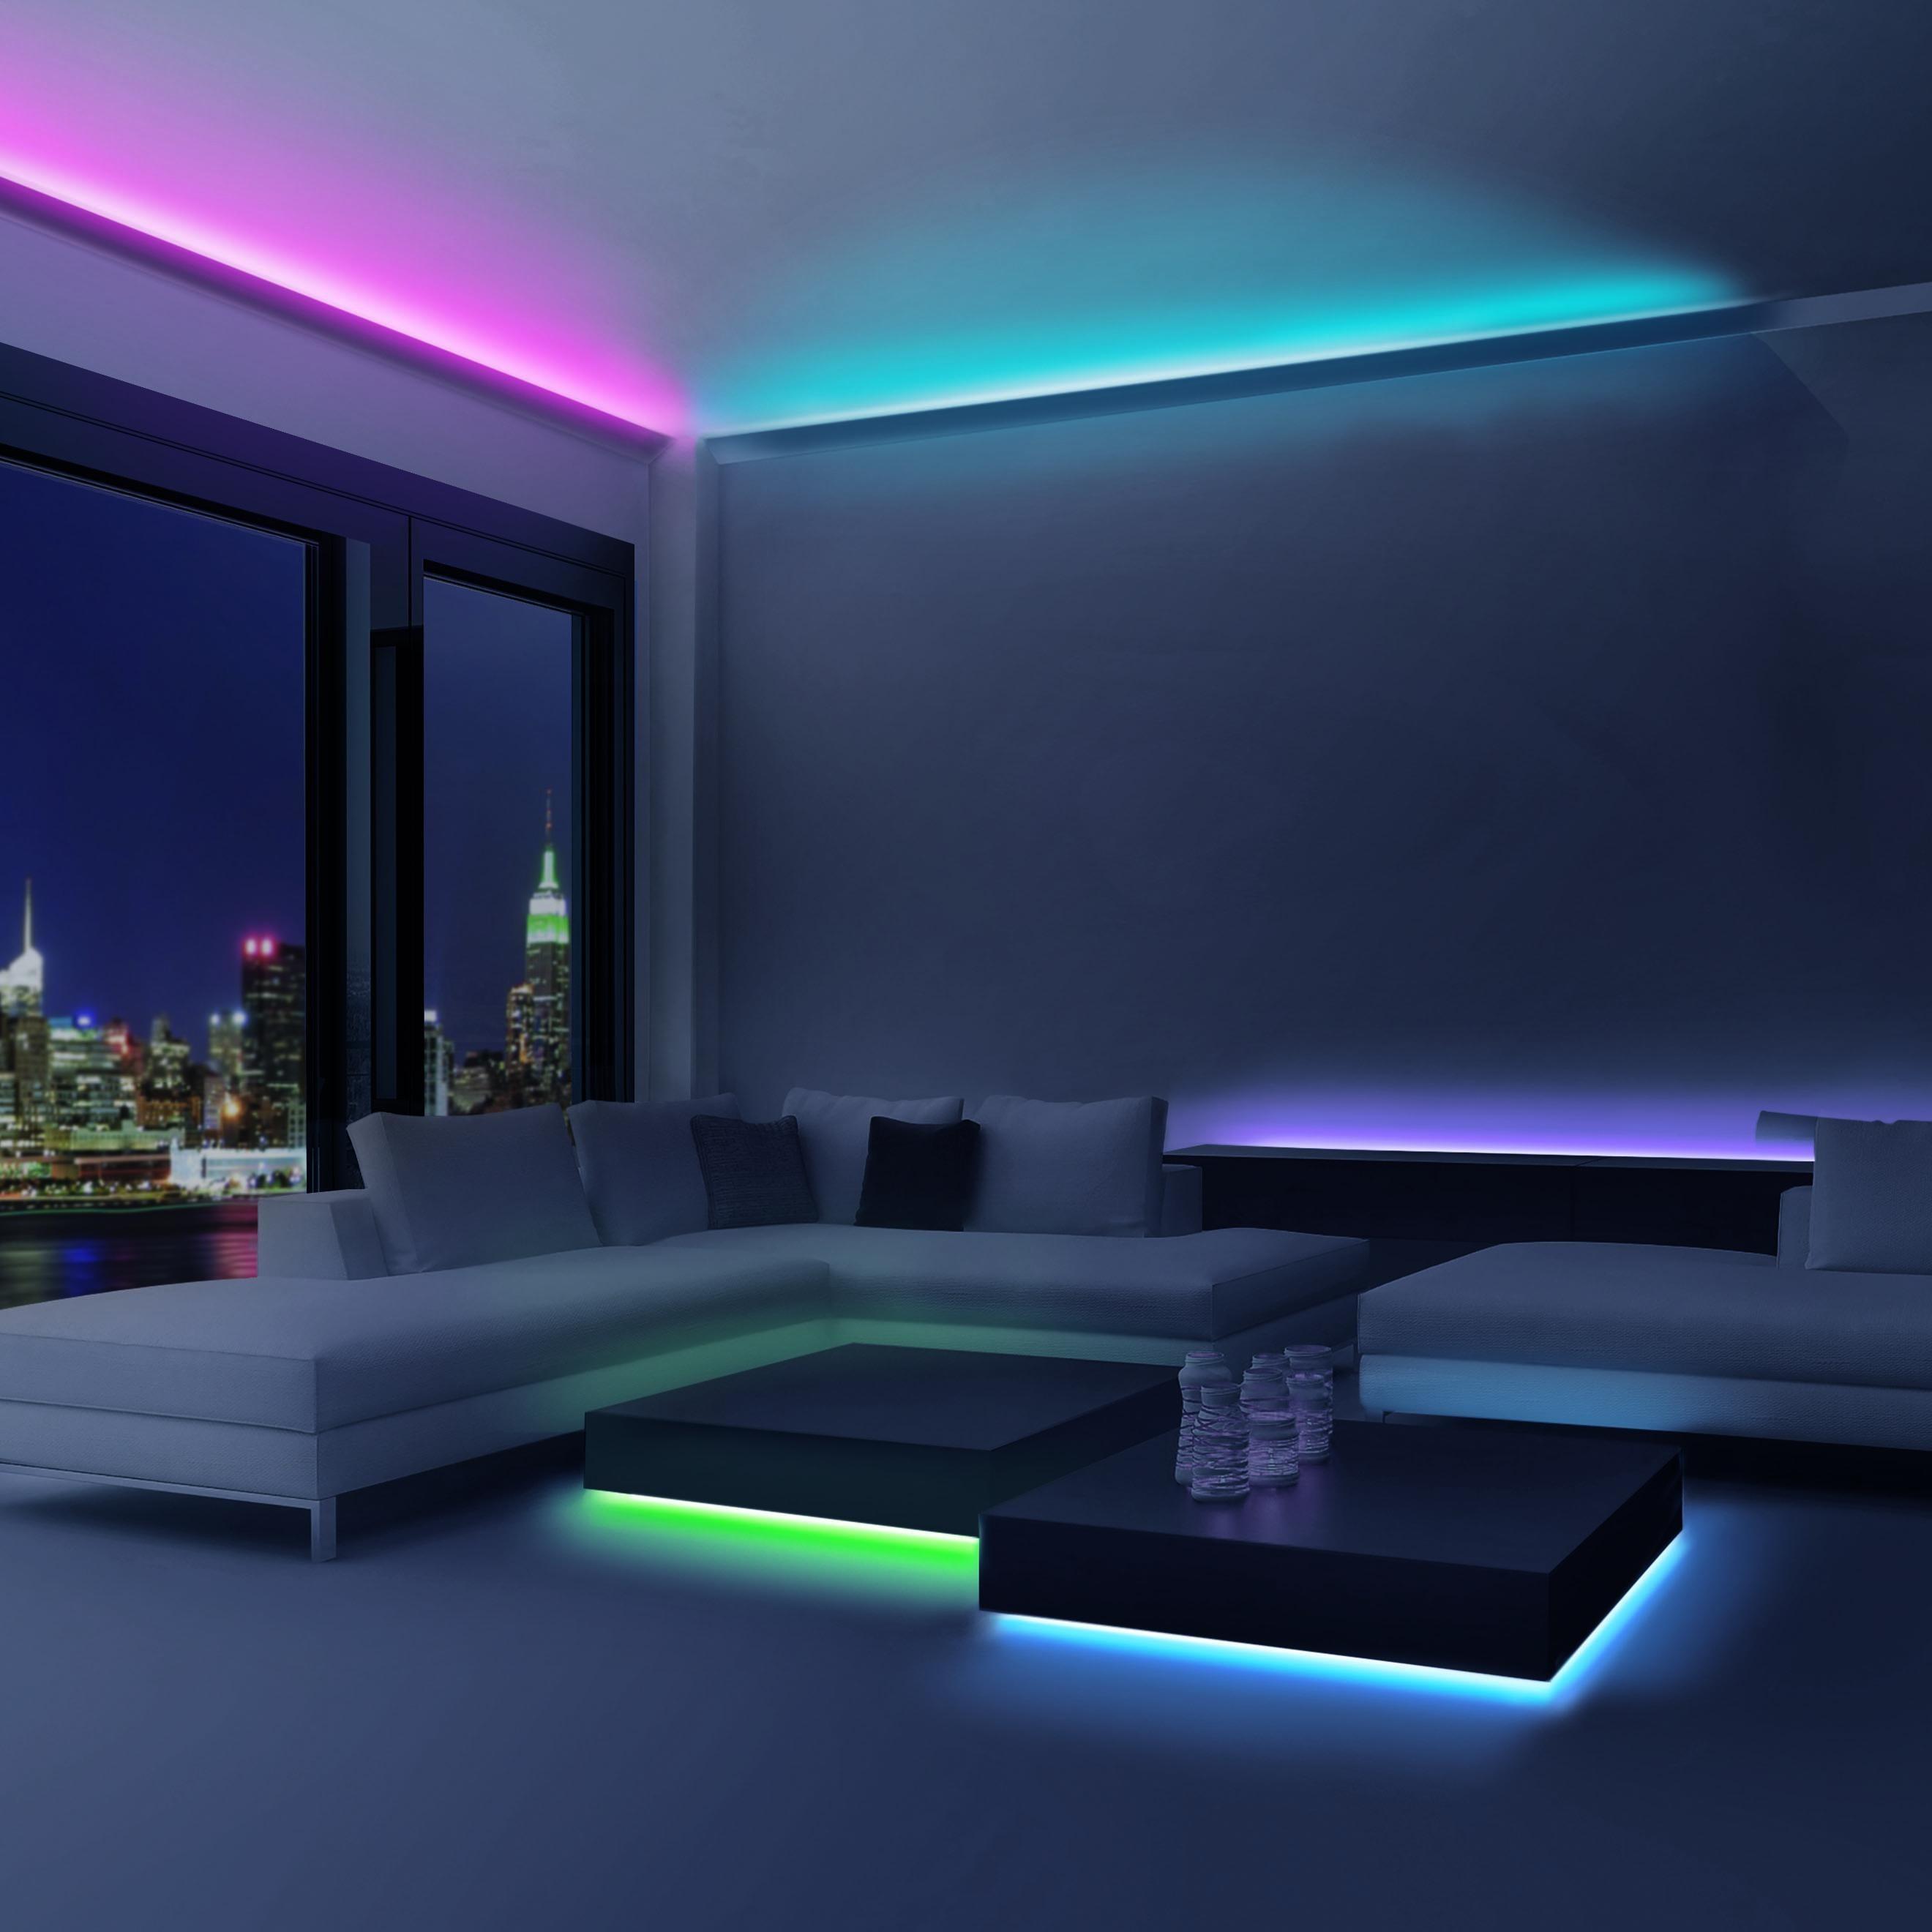 LED strip lights around the room